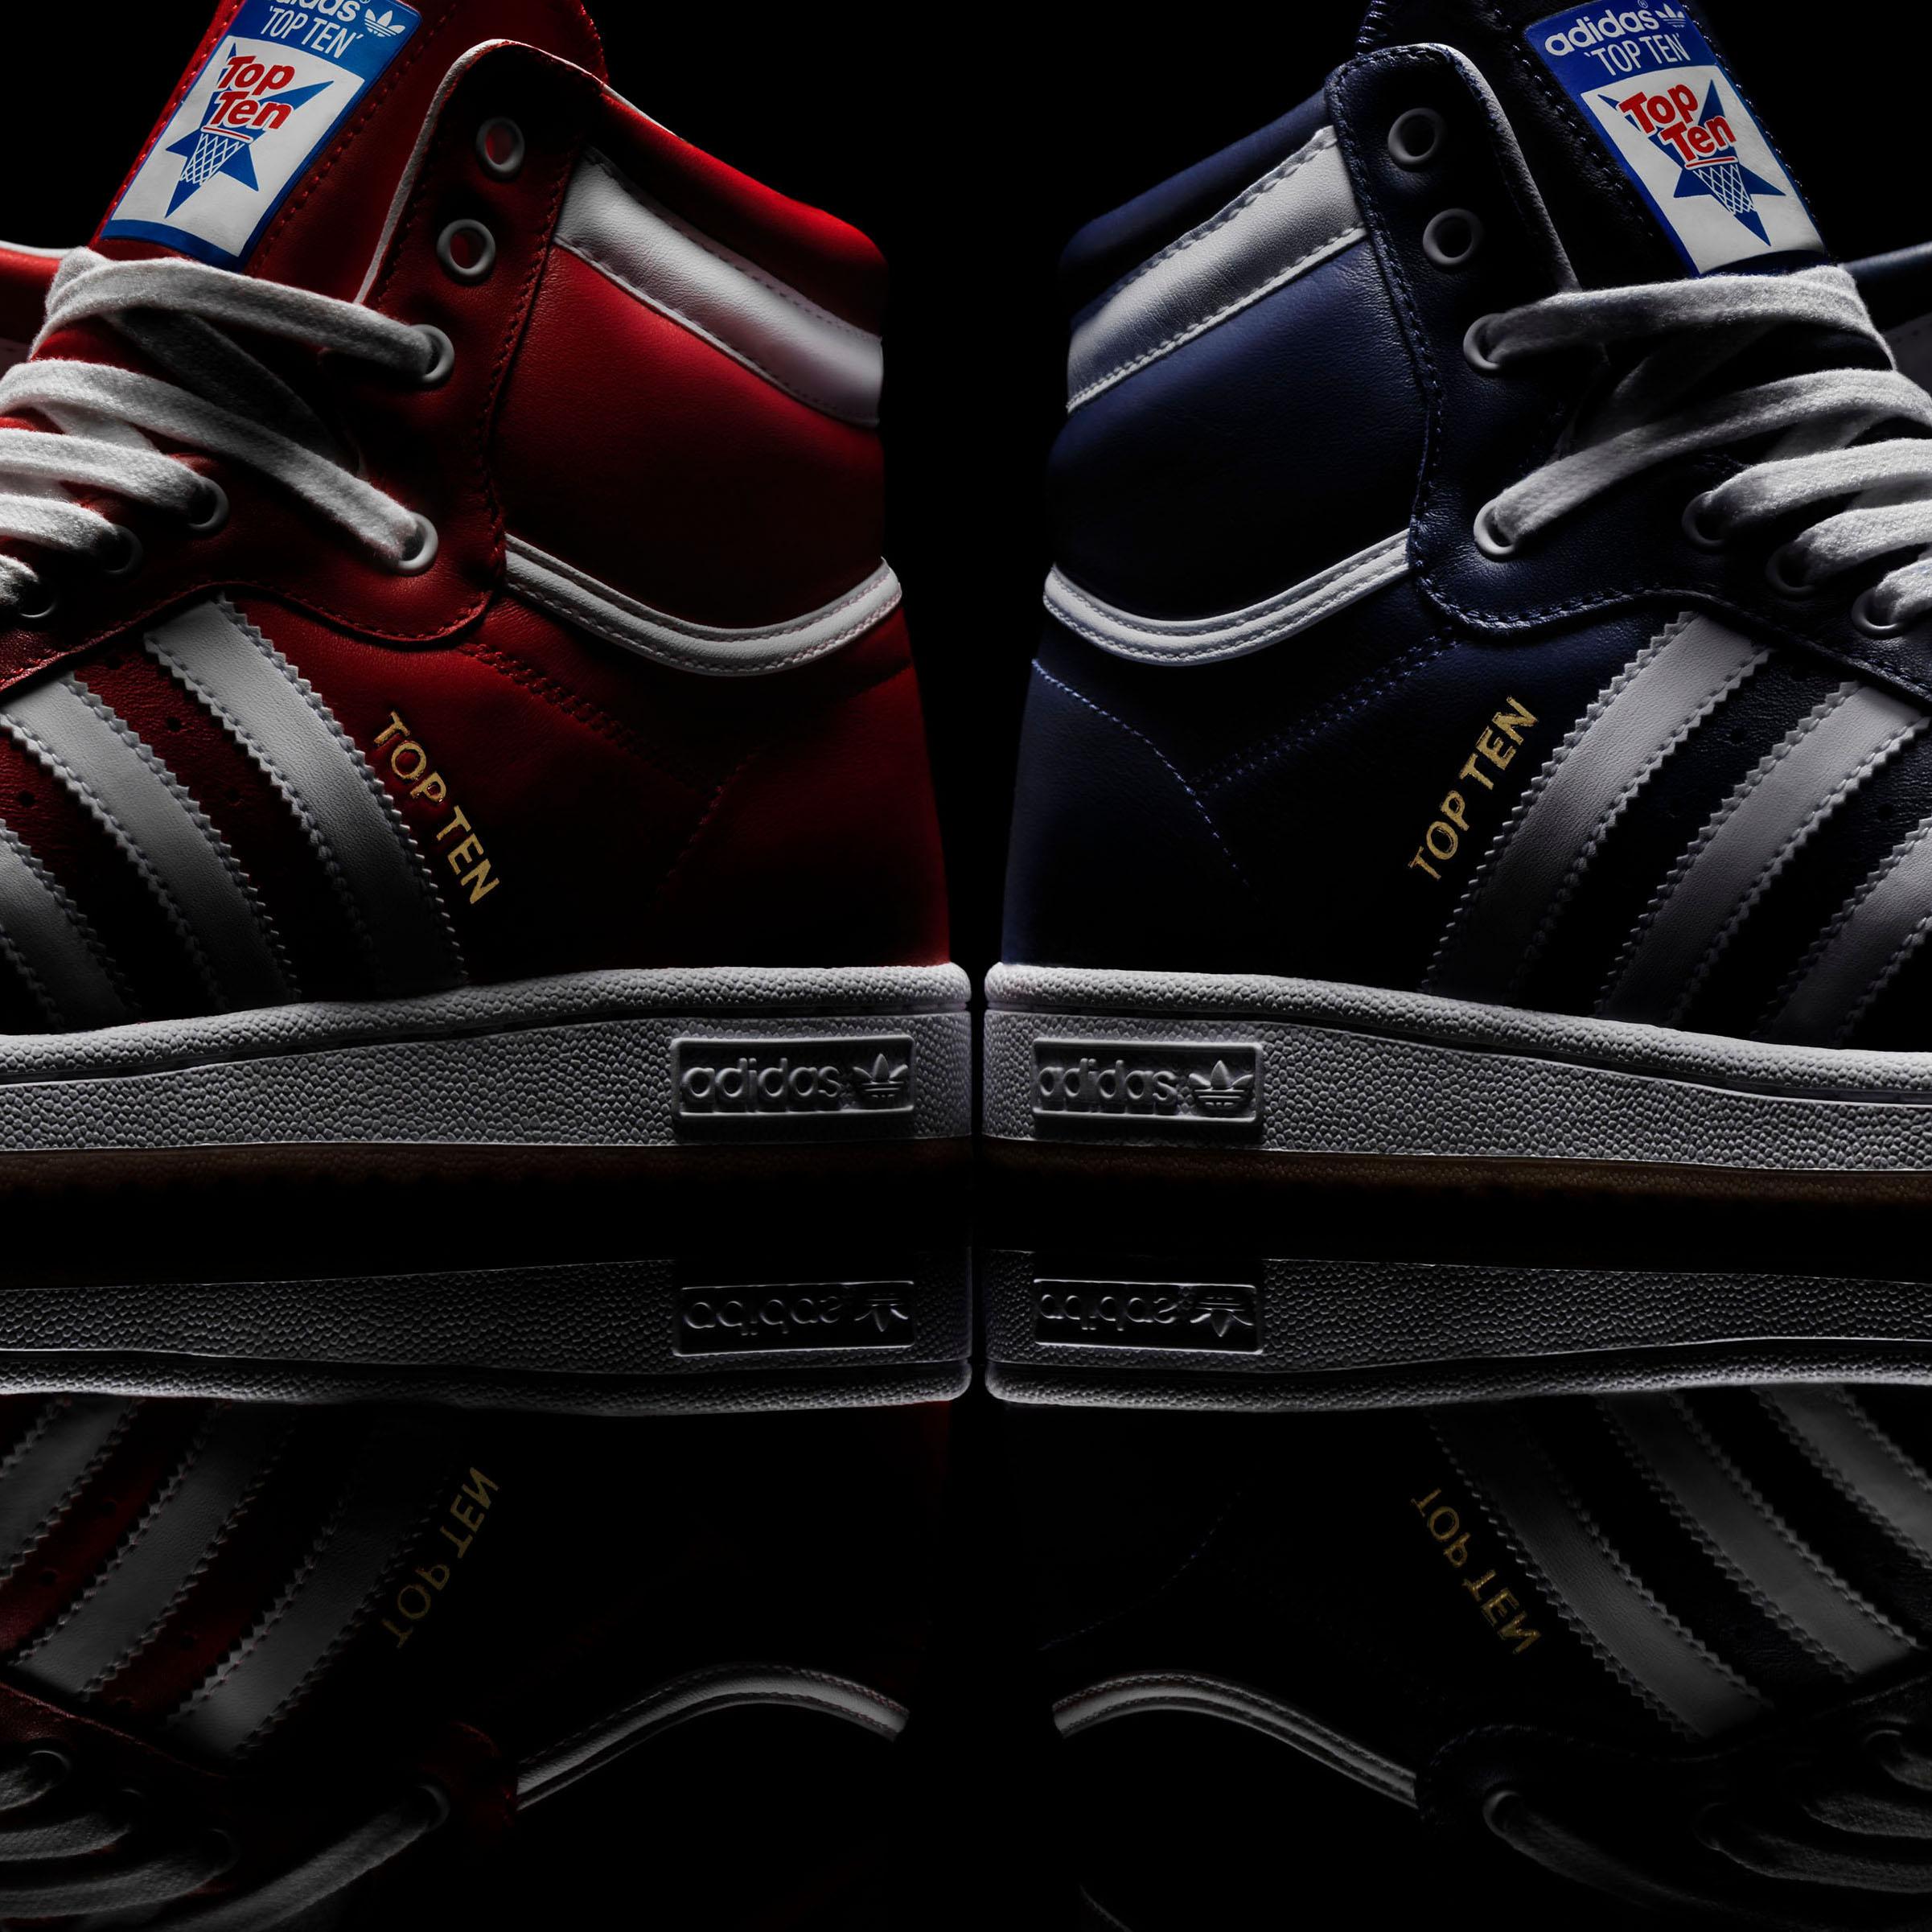 13133_Adidas_AllStr_Shoes_V2_v1-AFTER-ICN.jpg